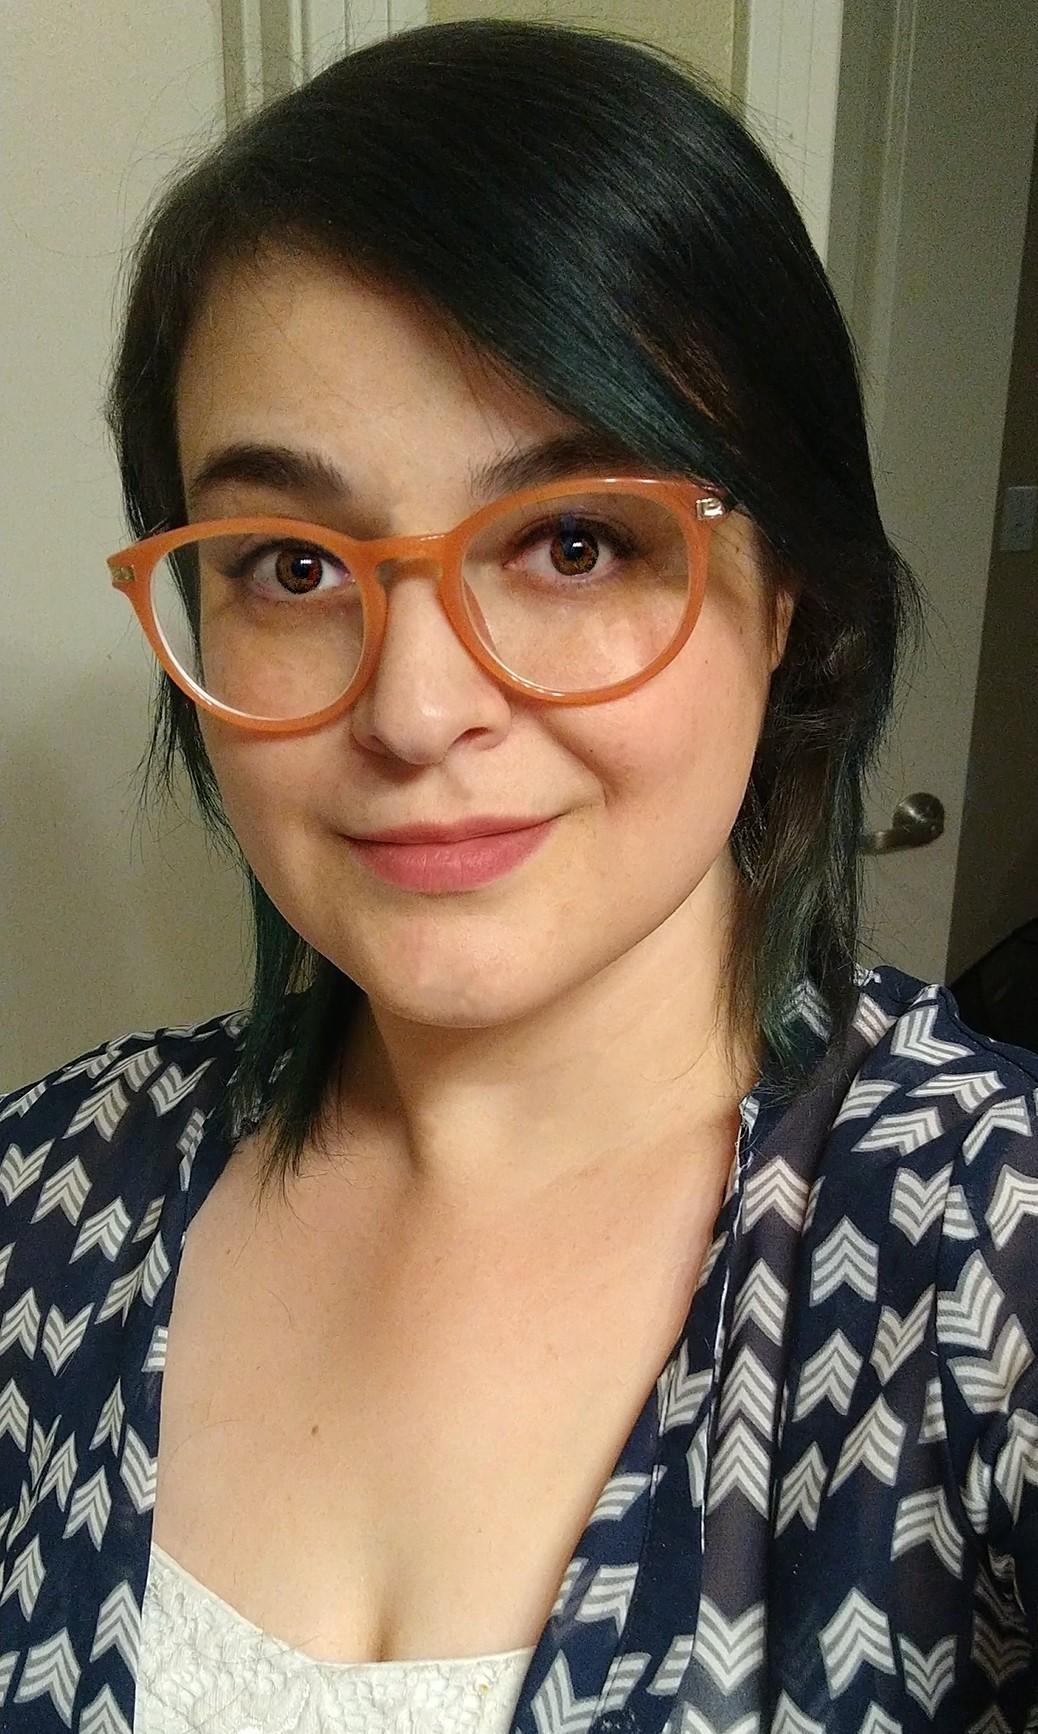 Stacie wears orange rim glasses for a selfie